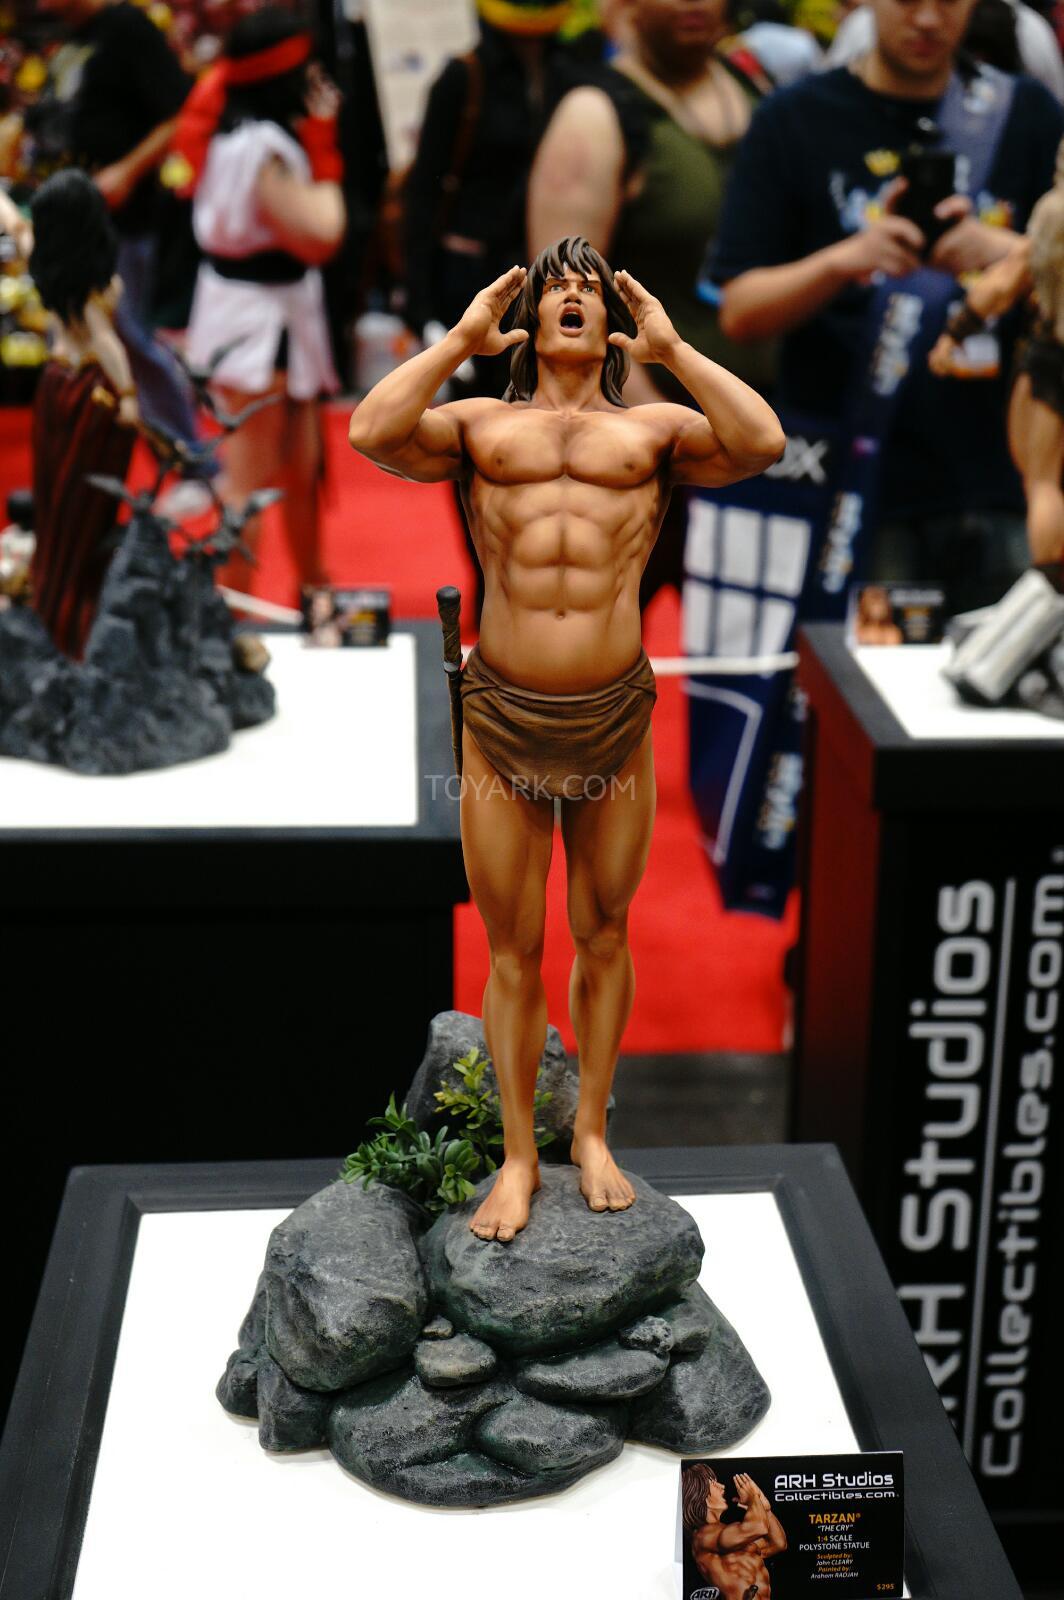 [ARH Studios] Tarzan Statue - Página 2 NYCC-2014-ARH-Studios-004